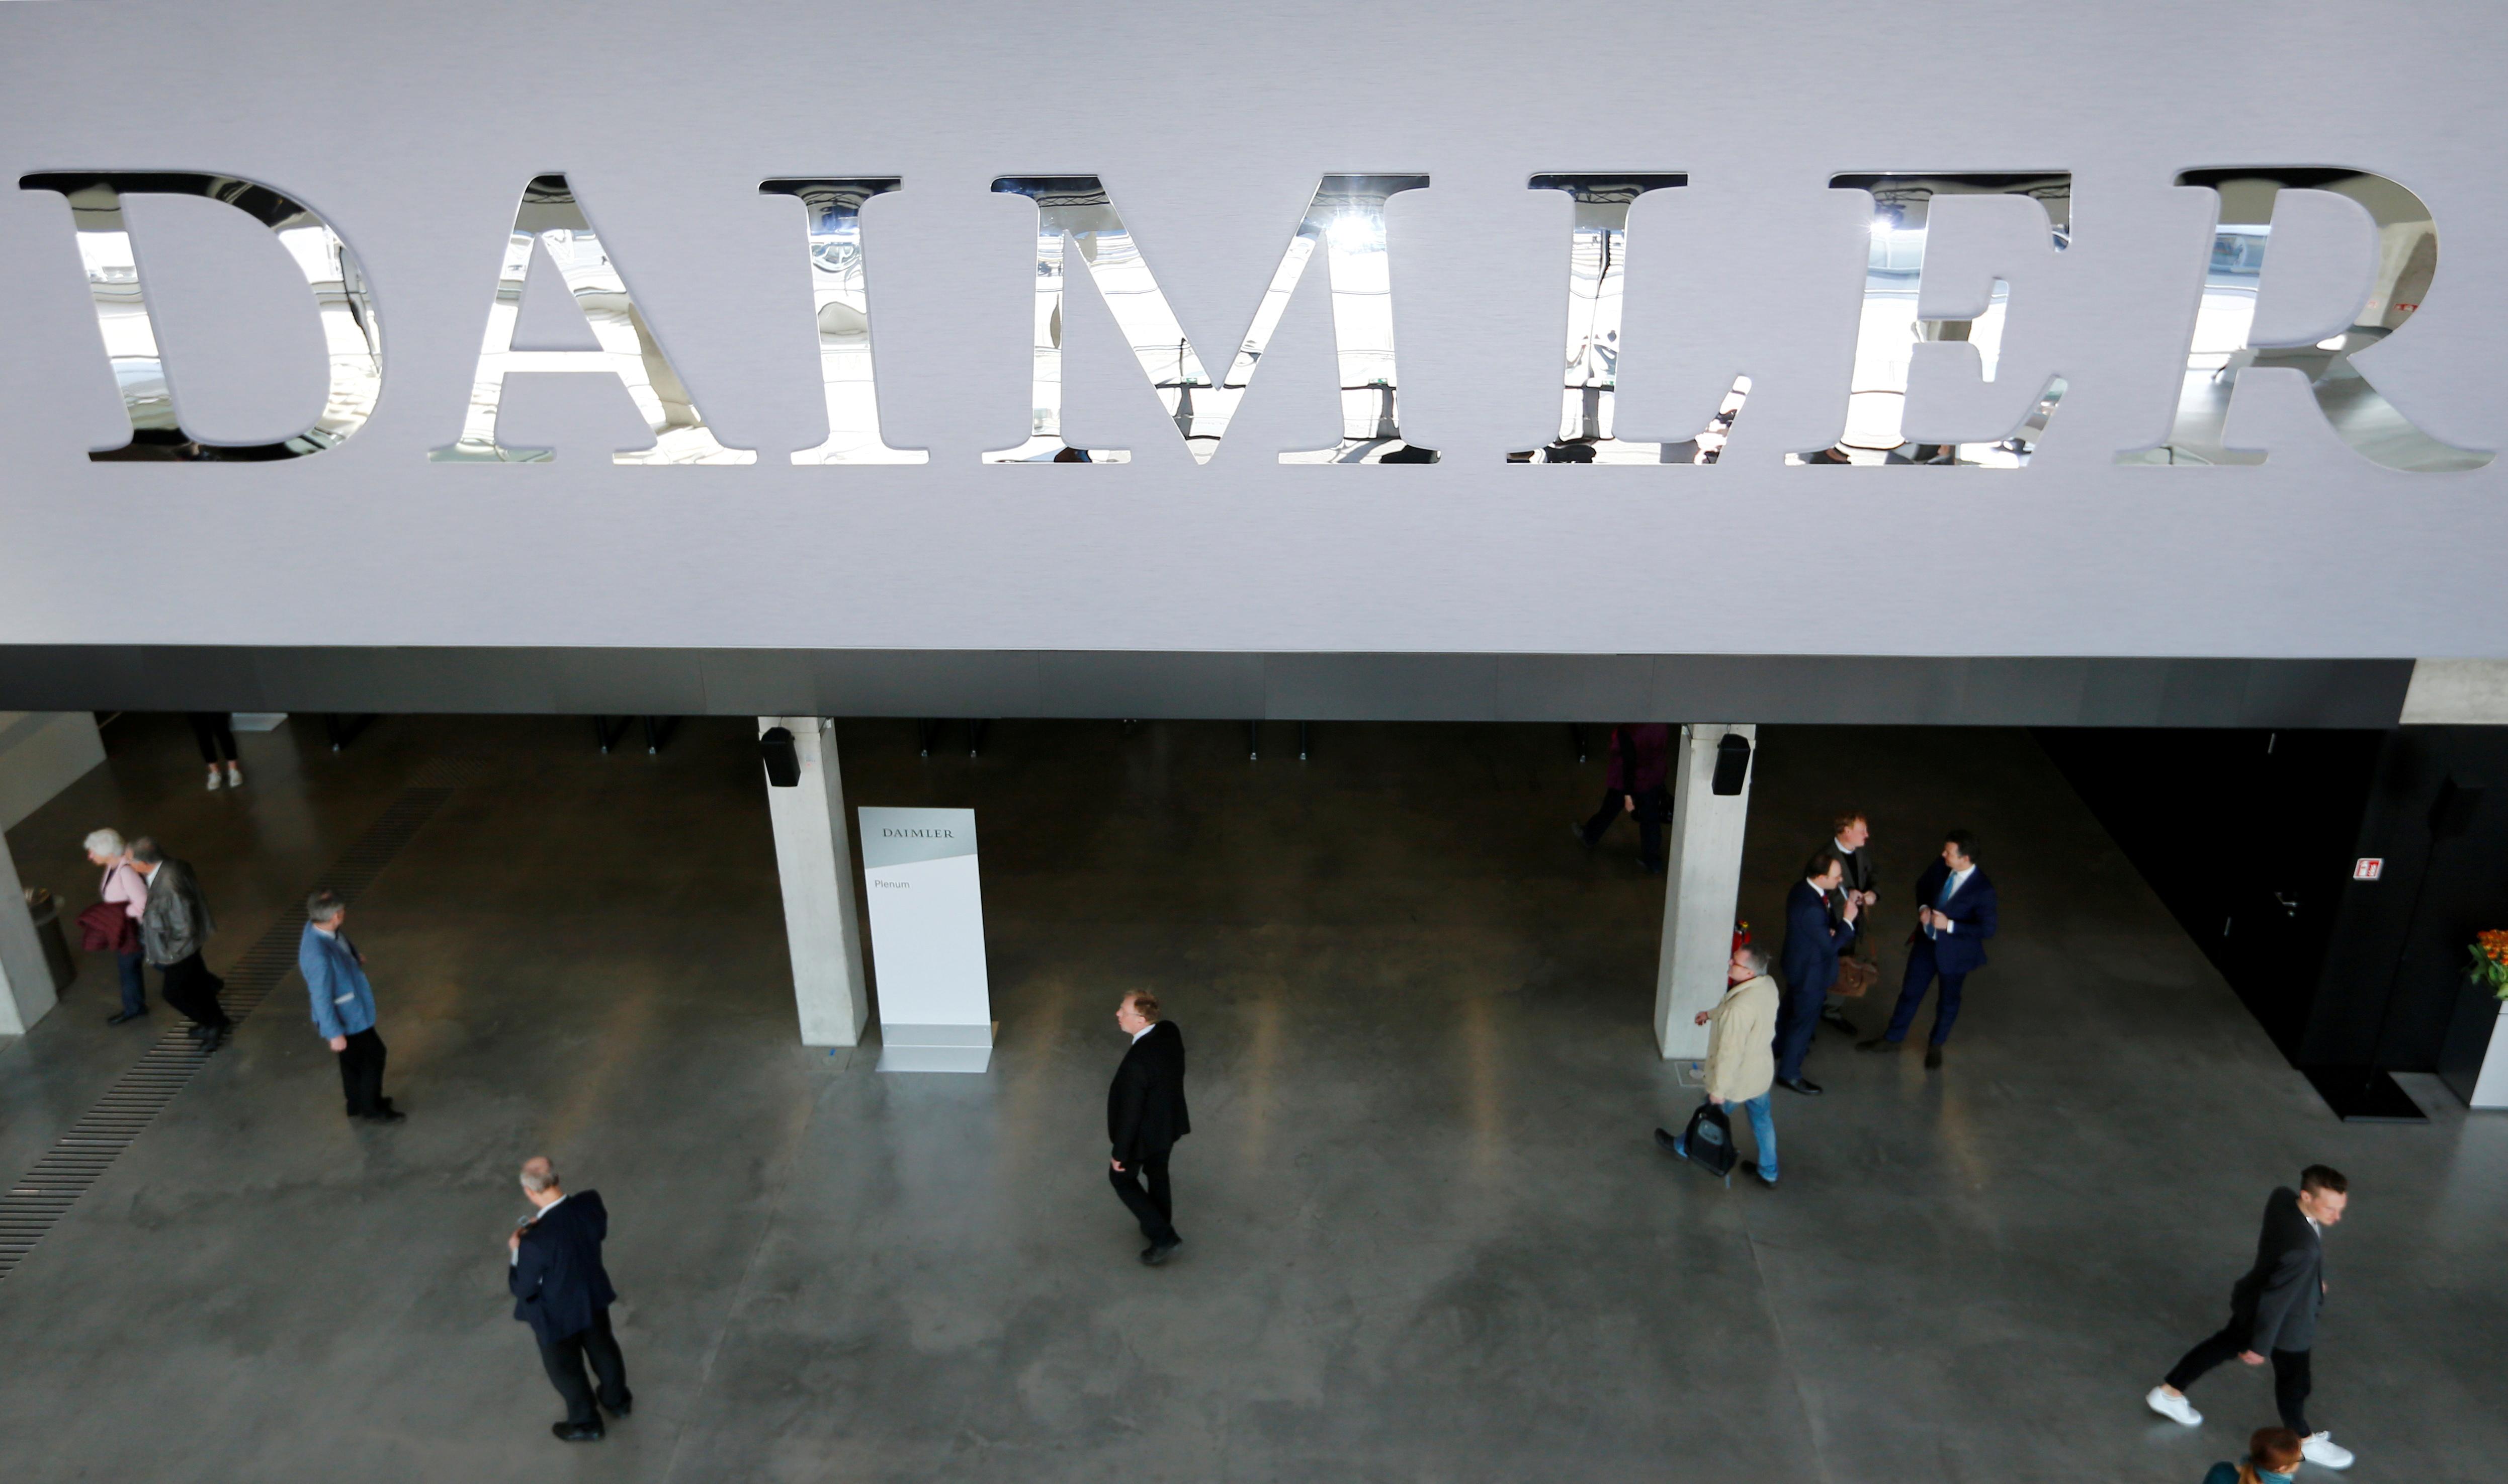 The Daimler logo is seen before the Daimler annual shareholder meeting in Berlin, Germany, April 5, 2018. REUTERS/Hannibal Hanschke